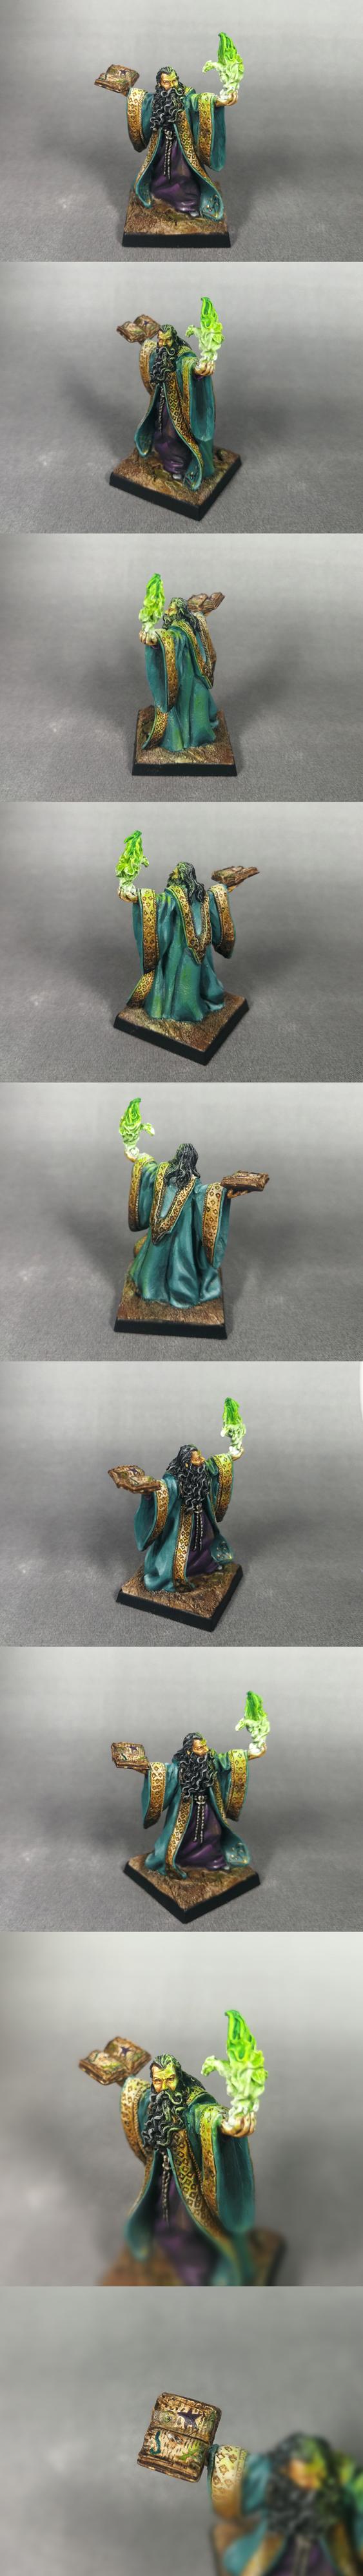 Reaper - Arcane mage